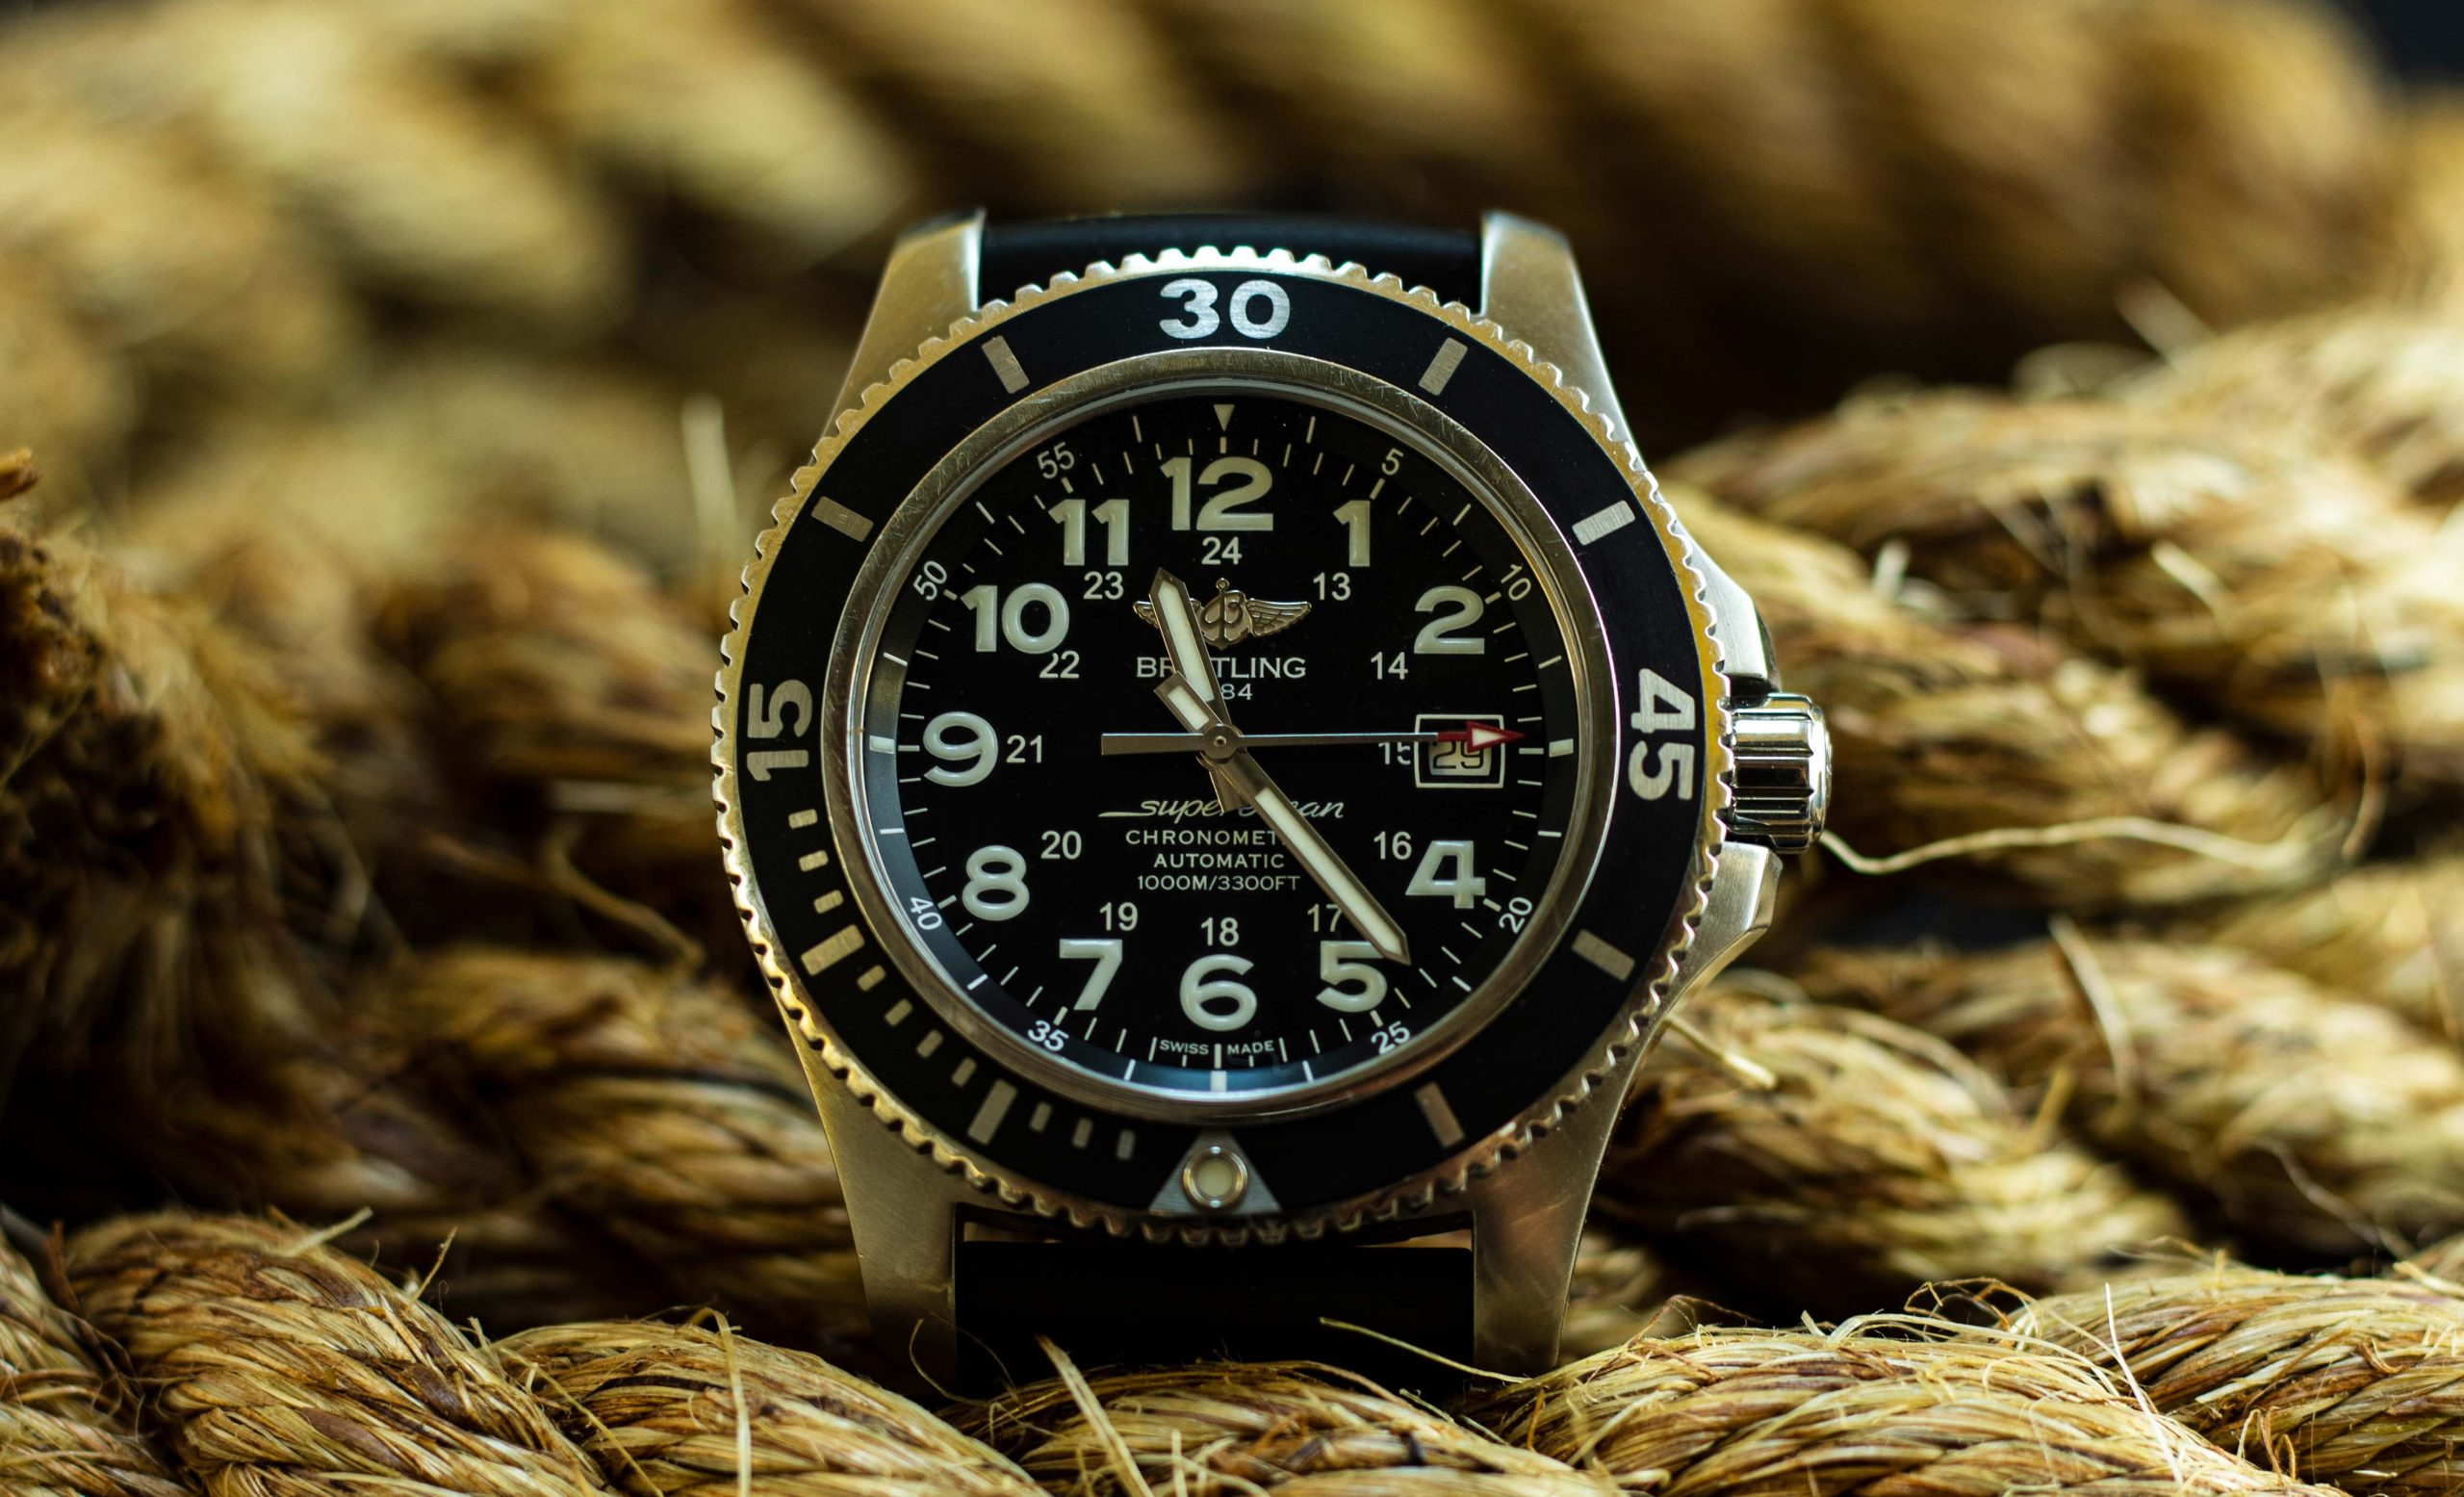 breitling watch between ropes